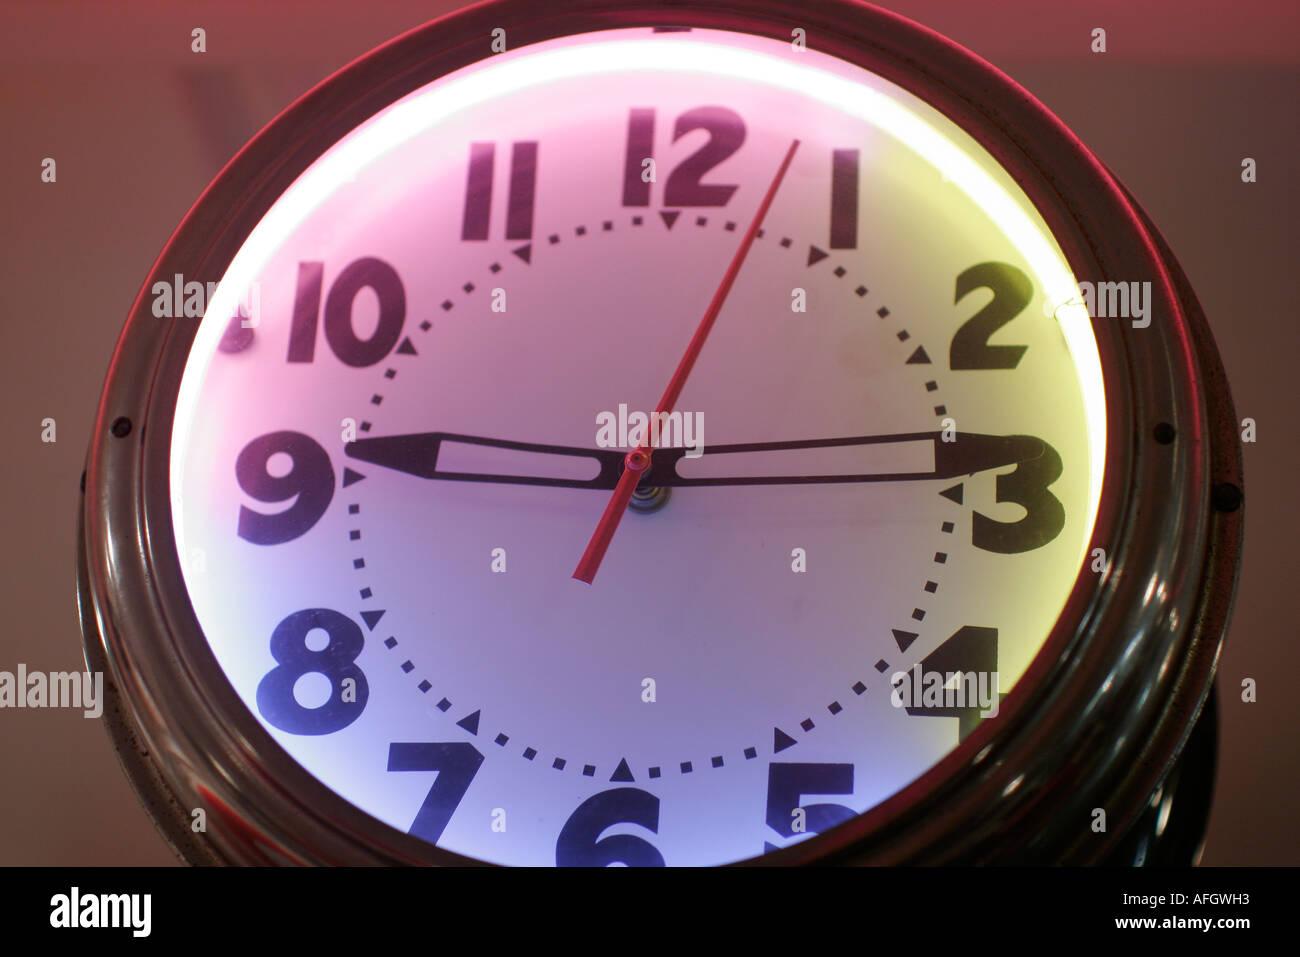 Miami Beach Florida Johnny Rocket's restaurant diner clock